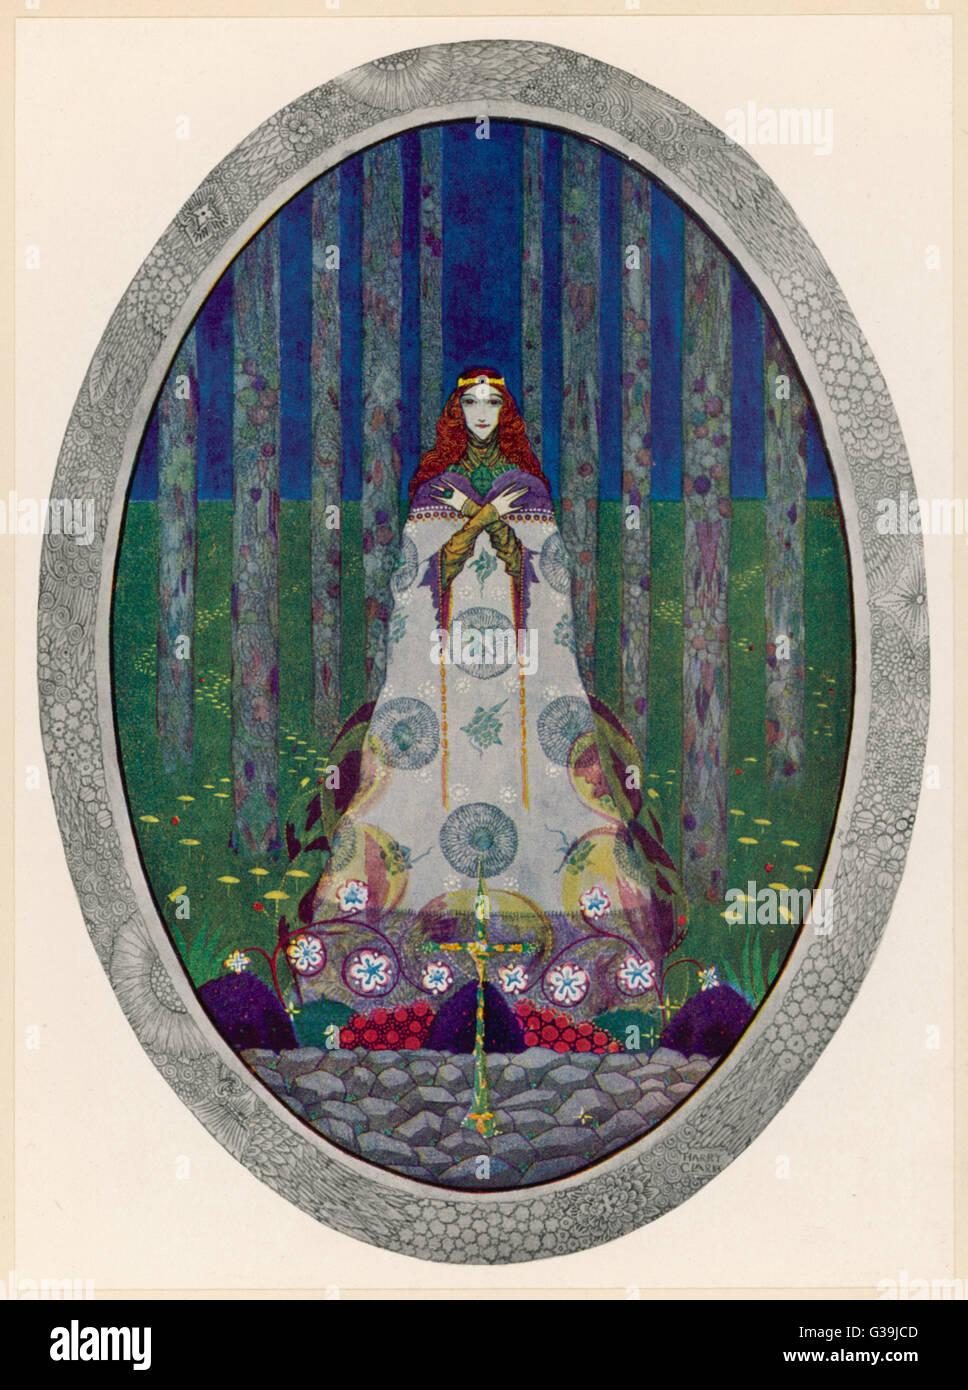 Illustration Of The Marsh Kings Daughter In An Oval Frame